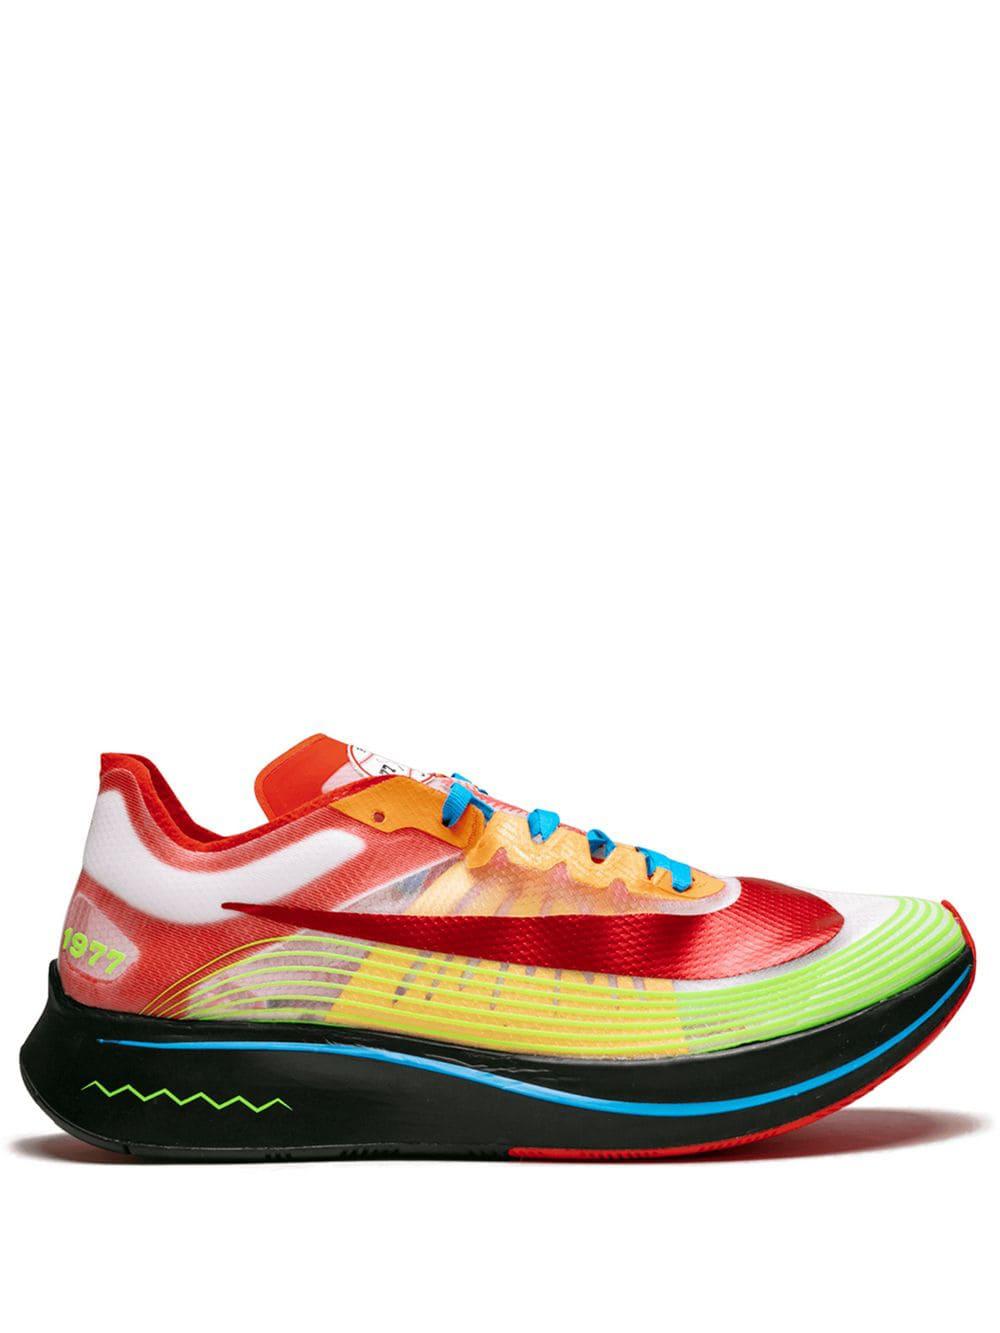 8513deeb8330 Nike Zoom Fly Sp Db Sneakers - White